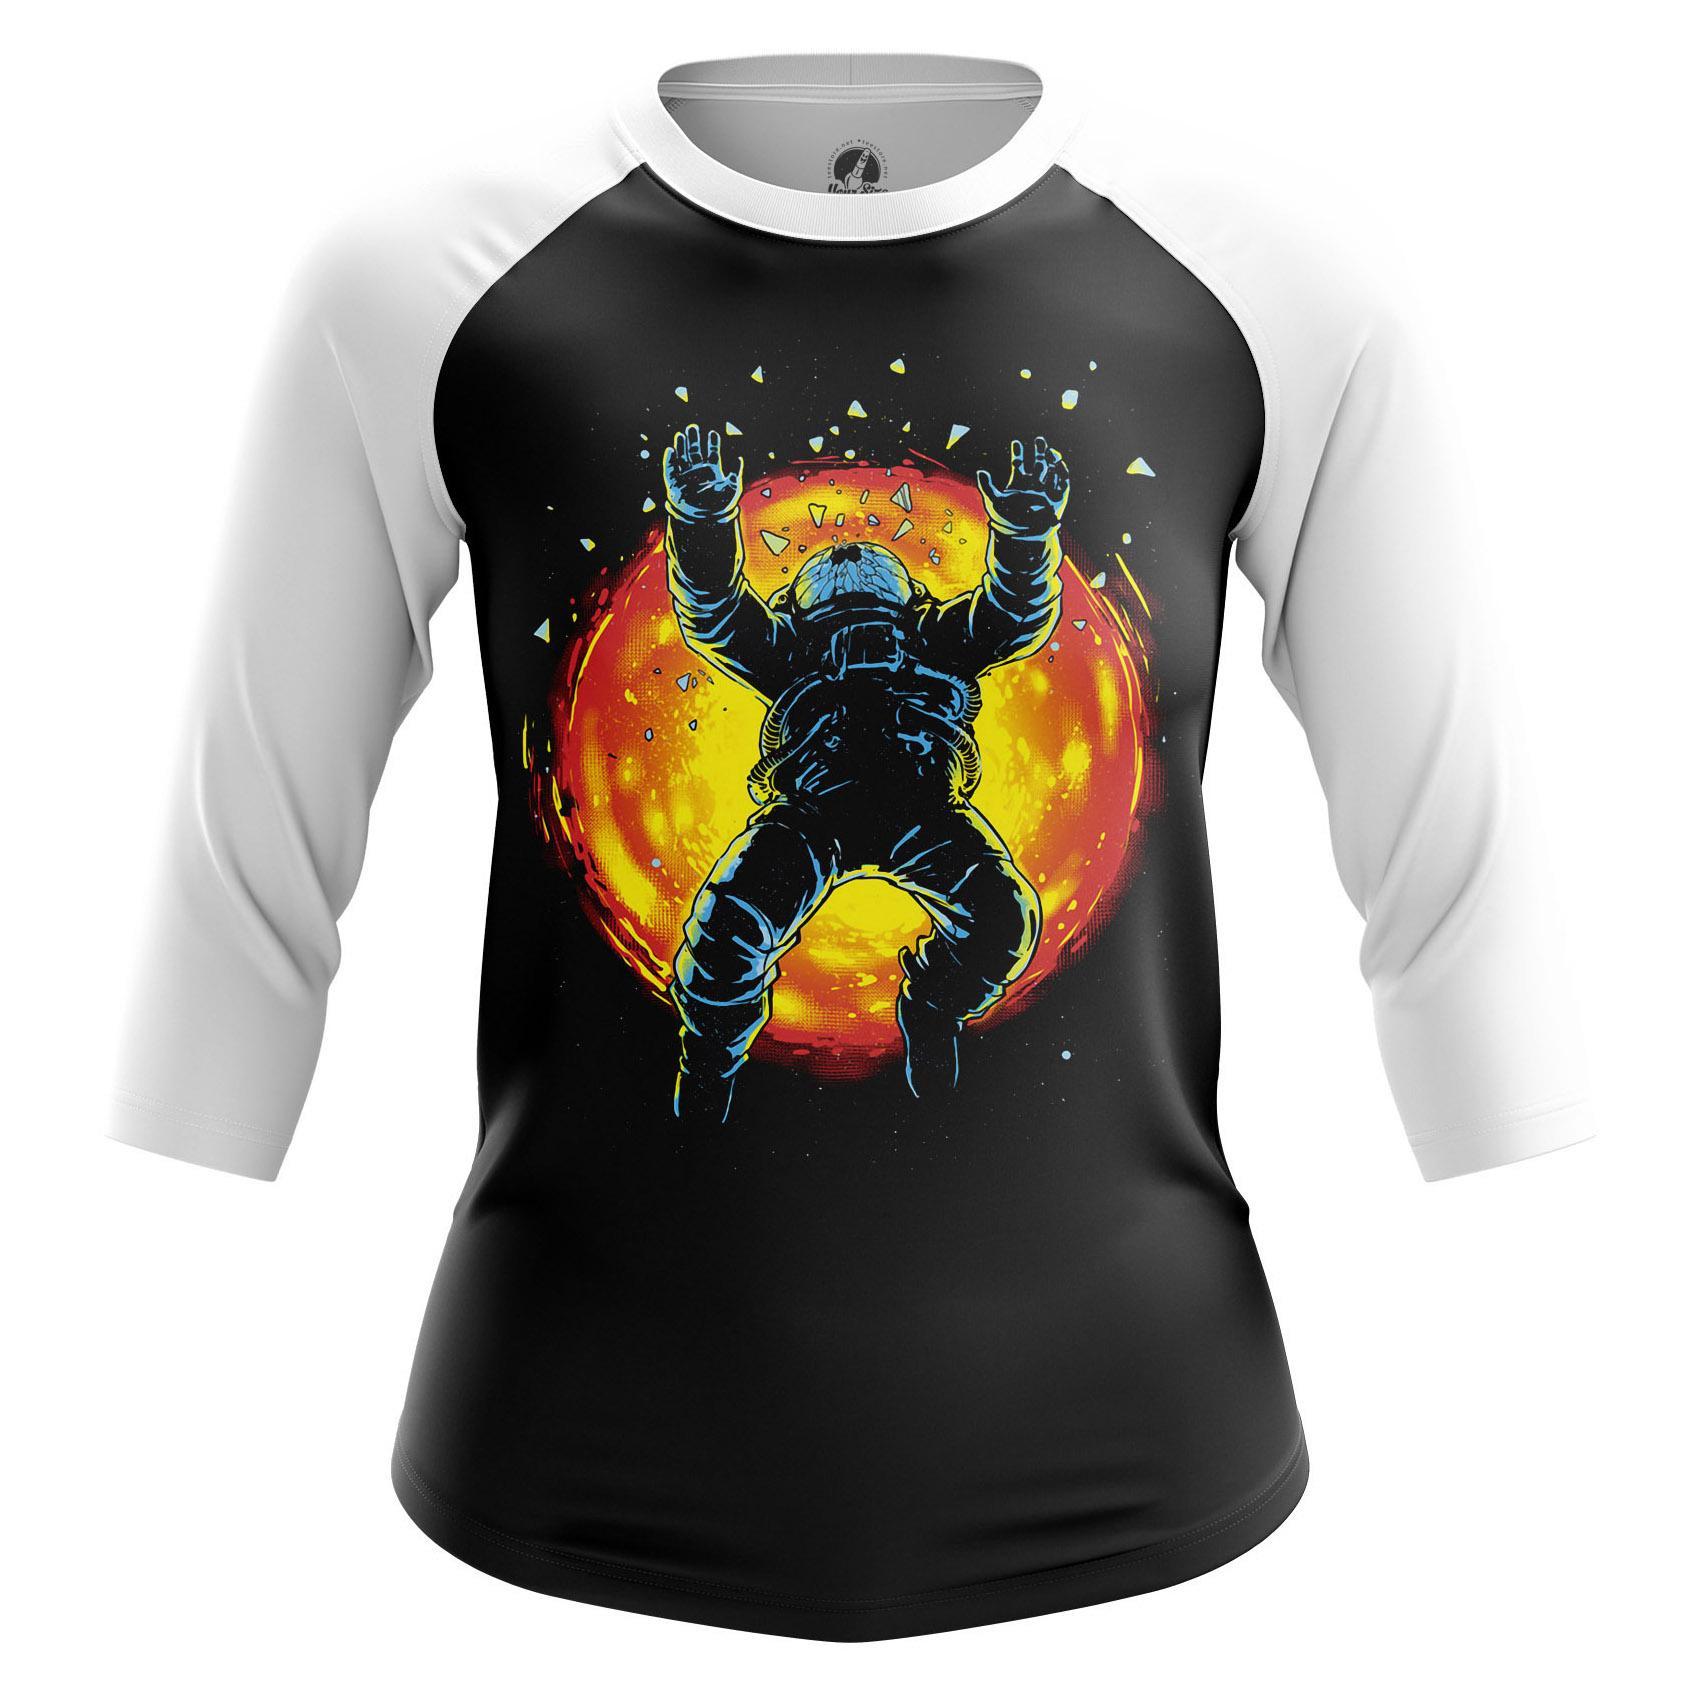 Merchandise Women'S Raglan Space Burst Astronaut